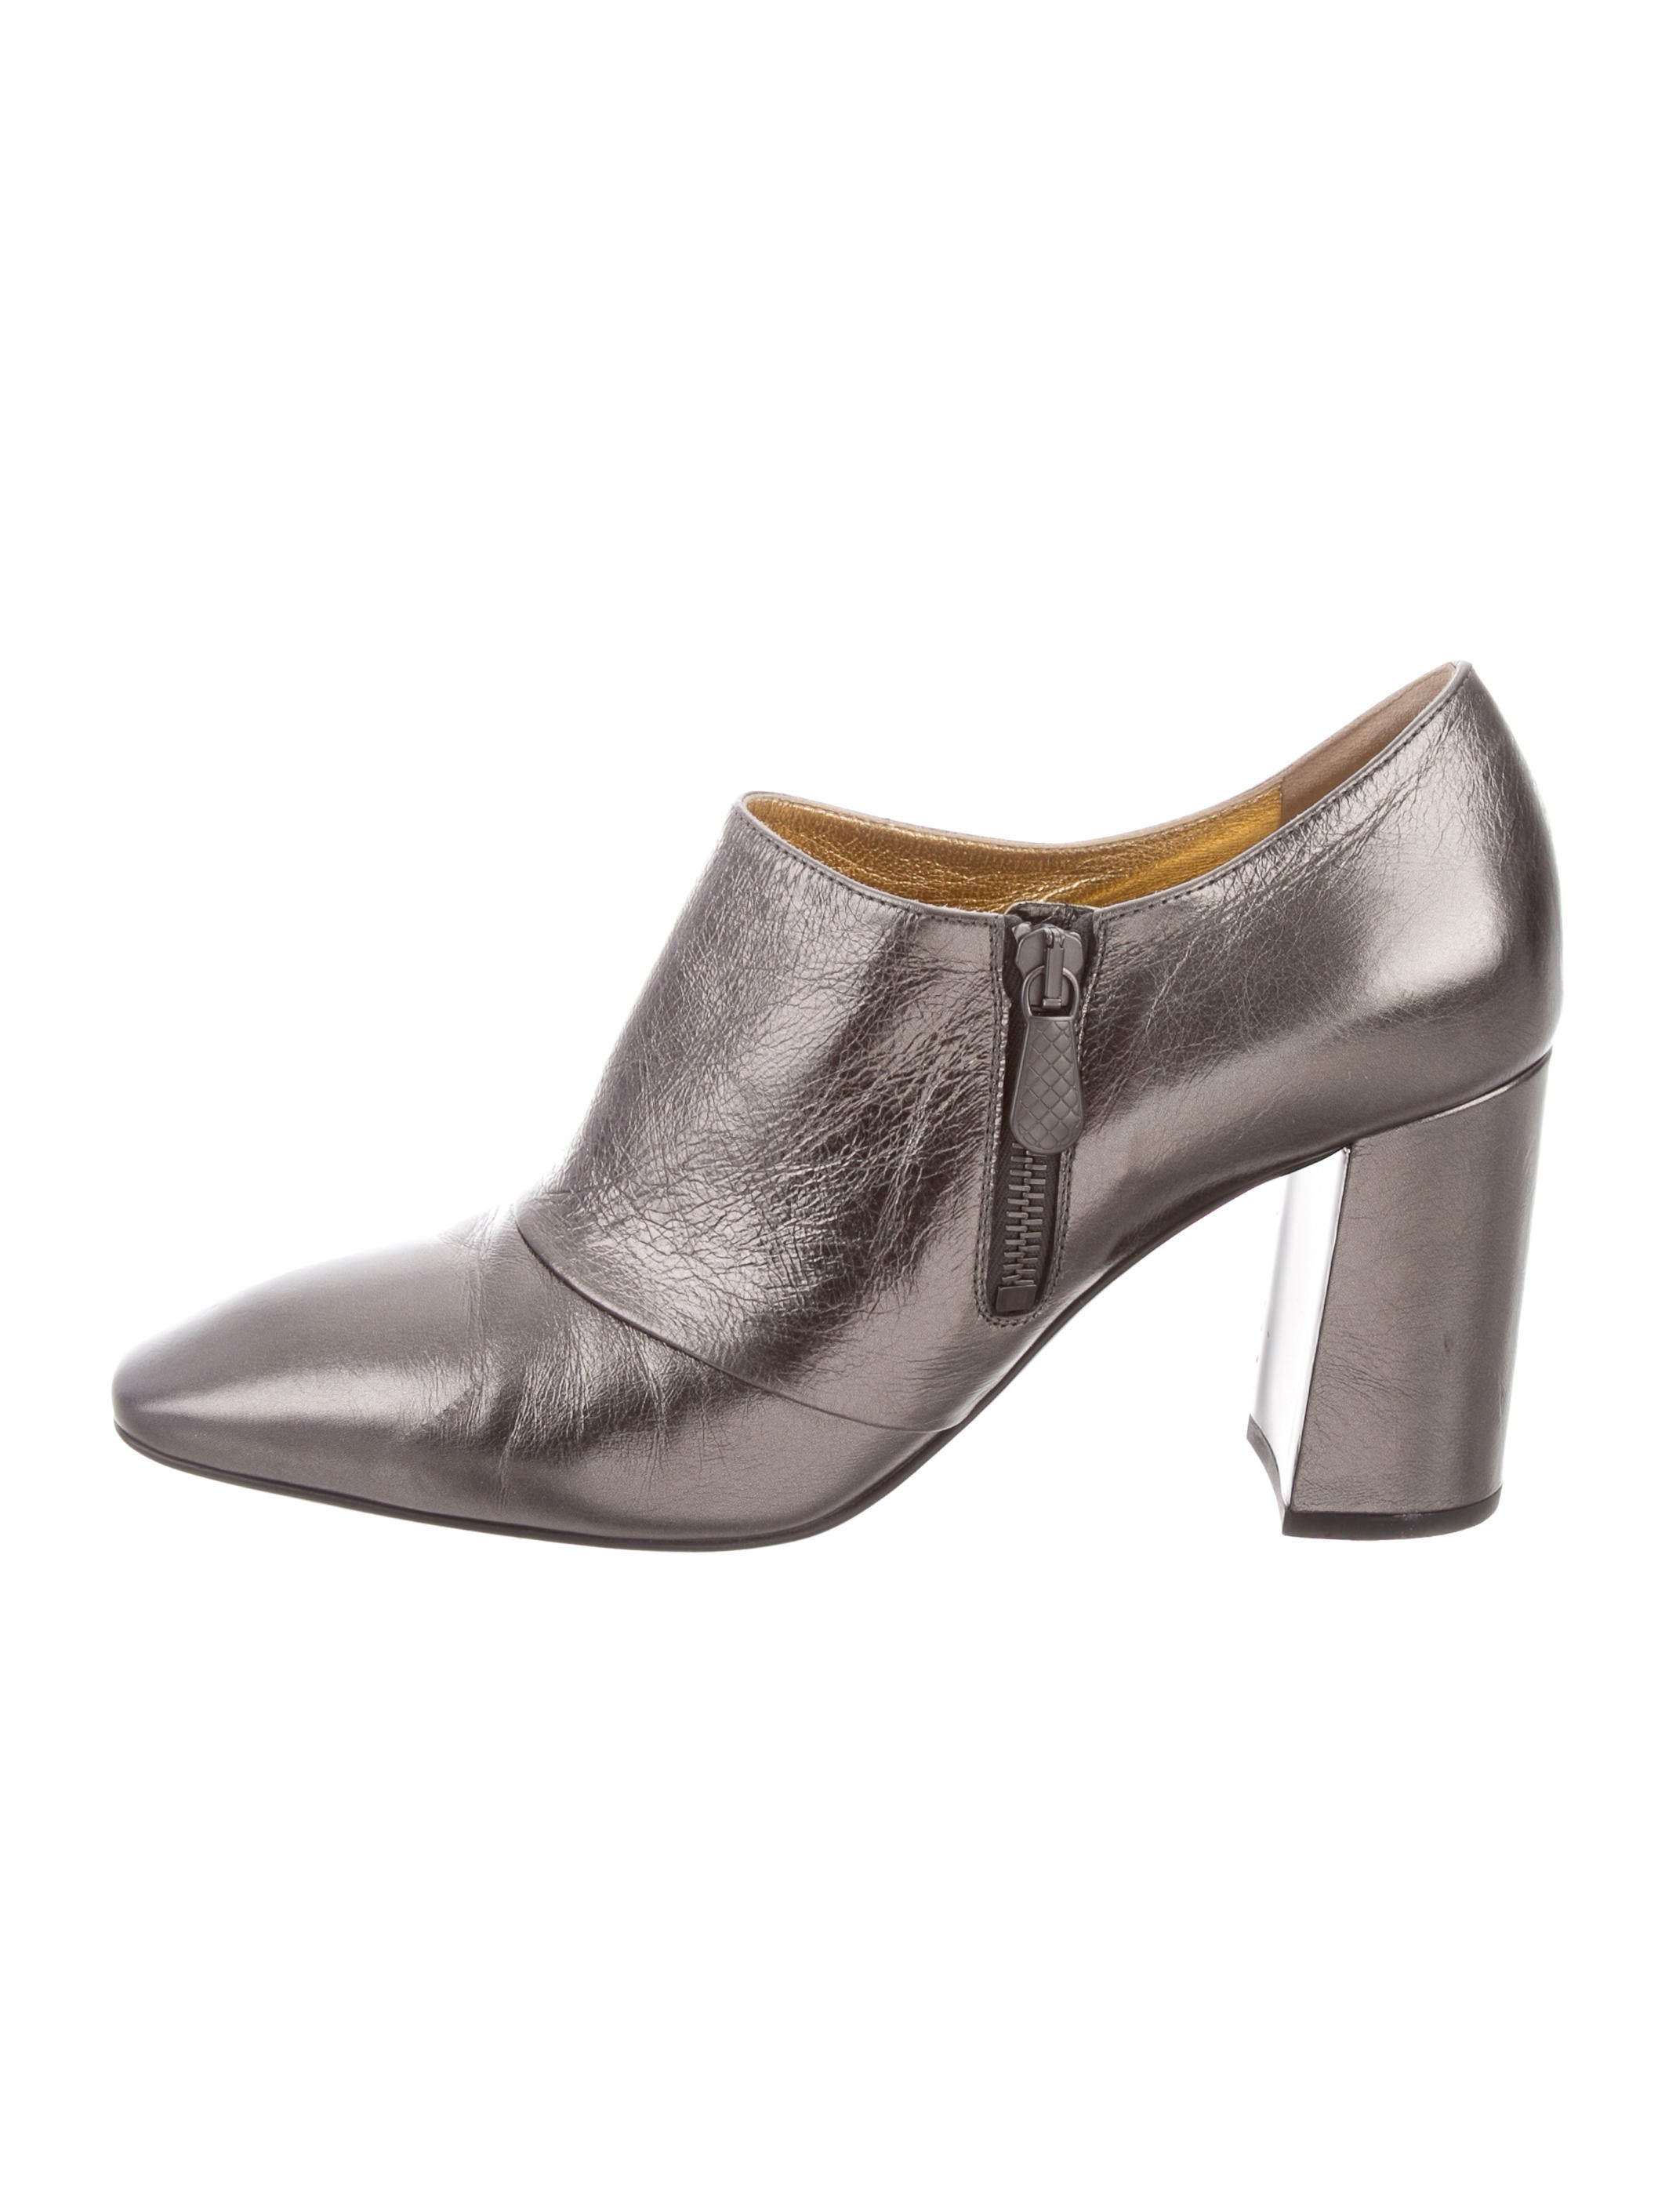 Bottega Veneta Metallic Leather Booties outlet great deals Manchester online wmTAM083